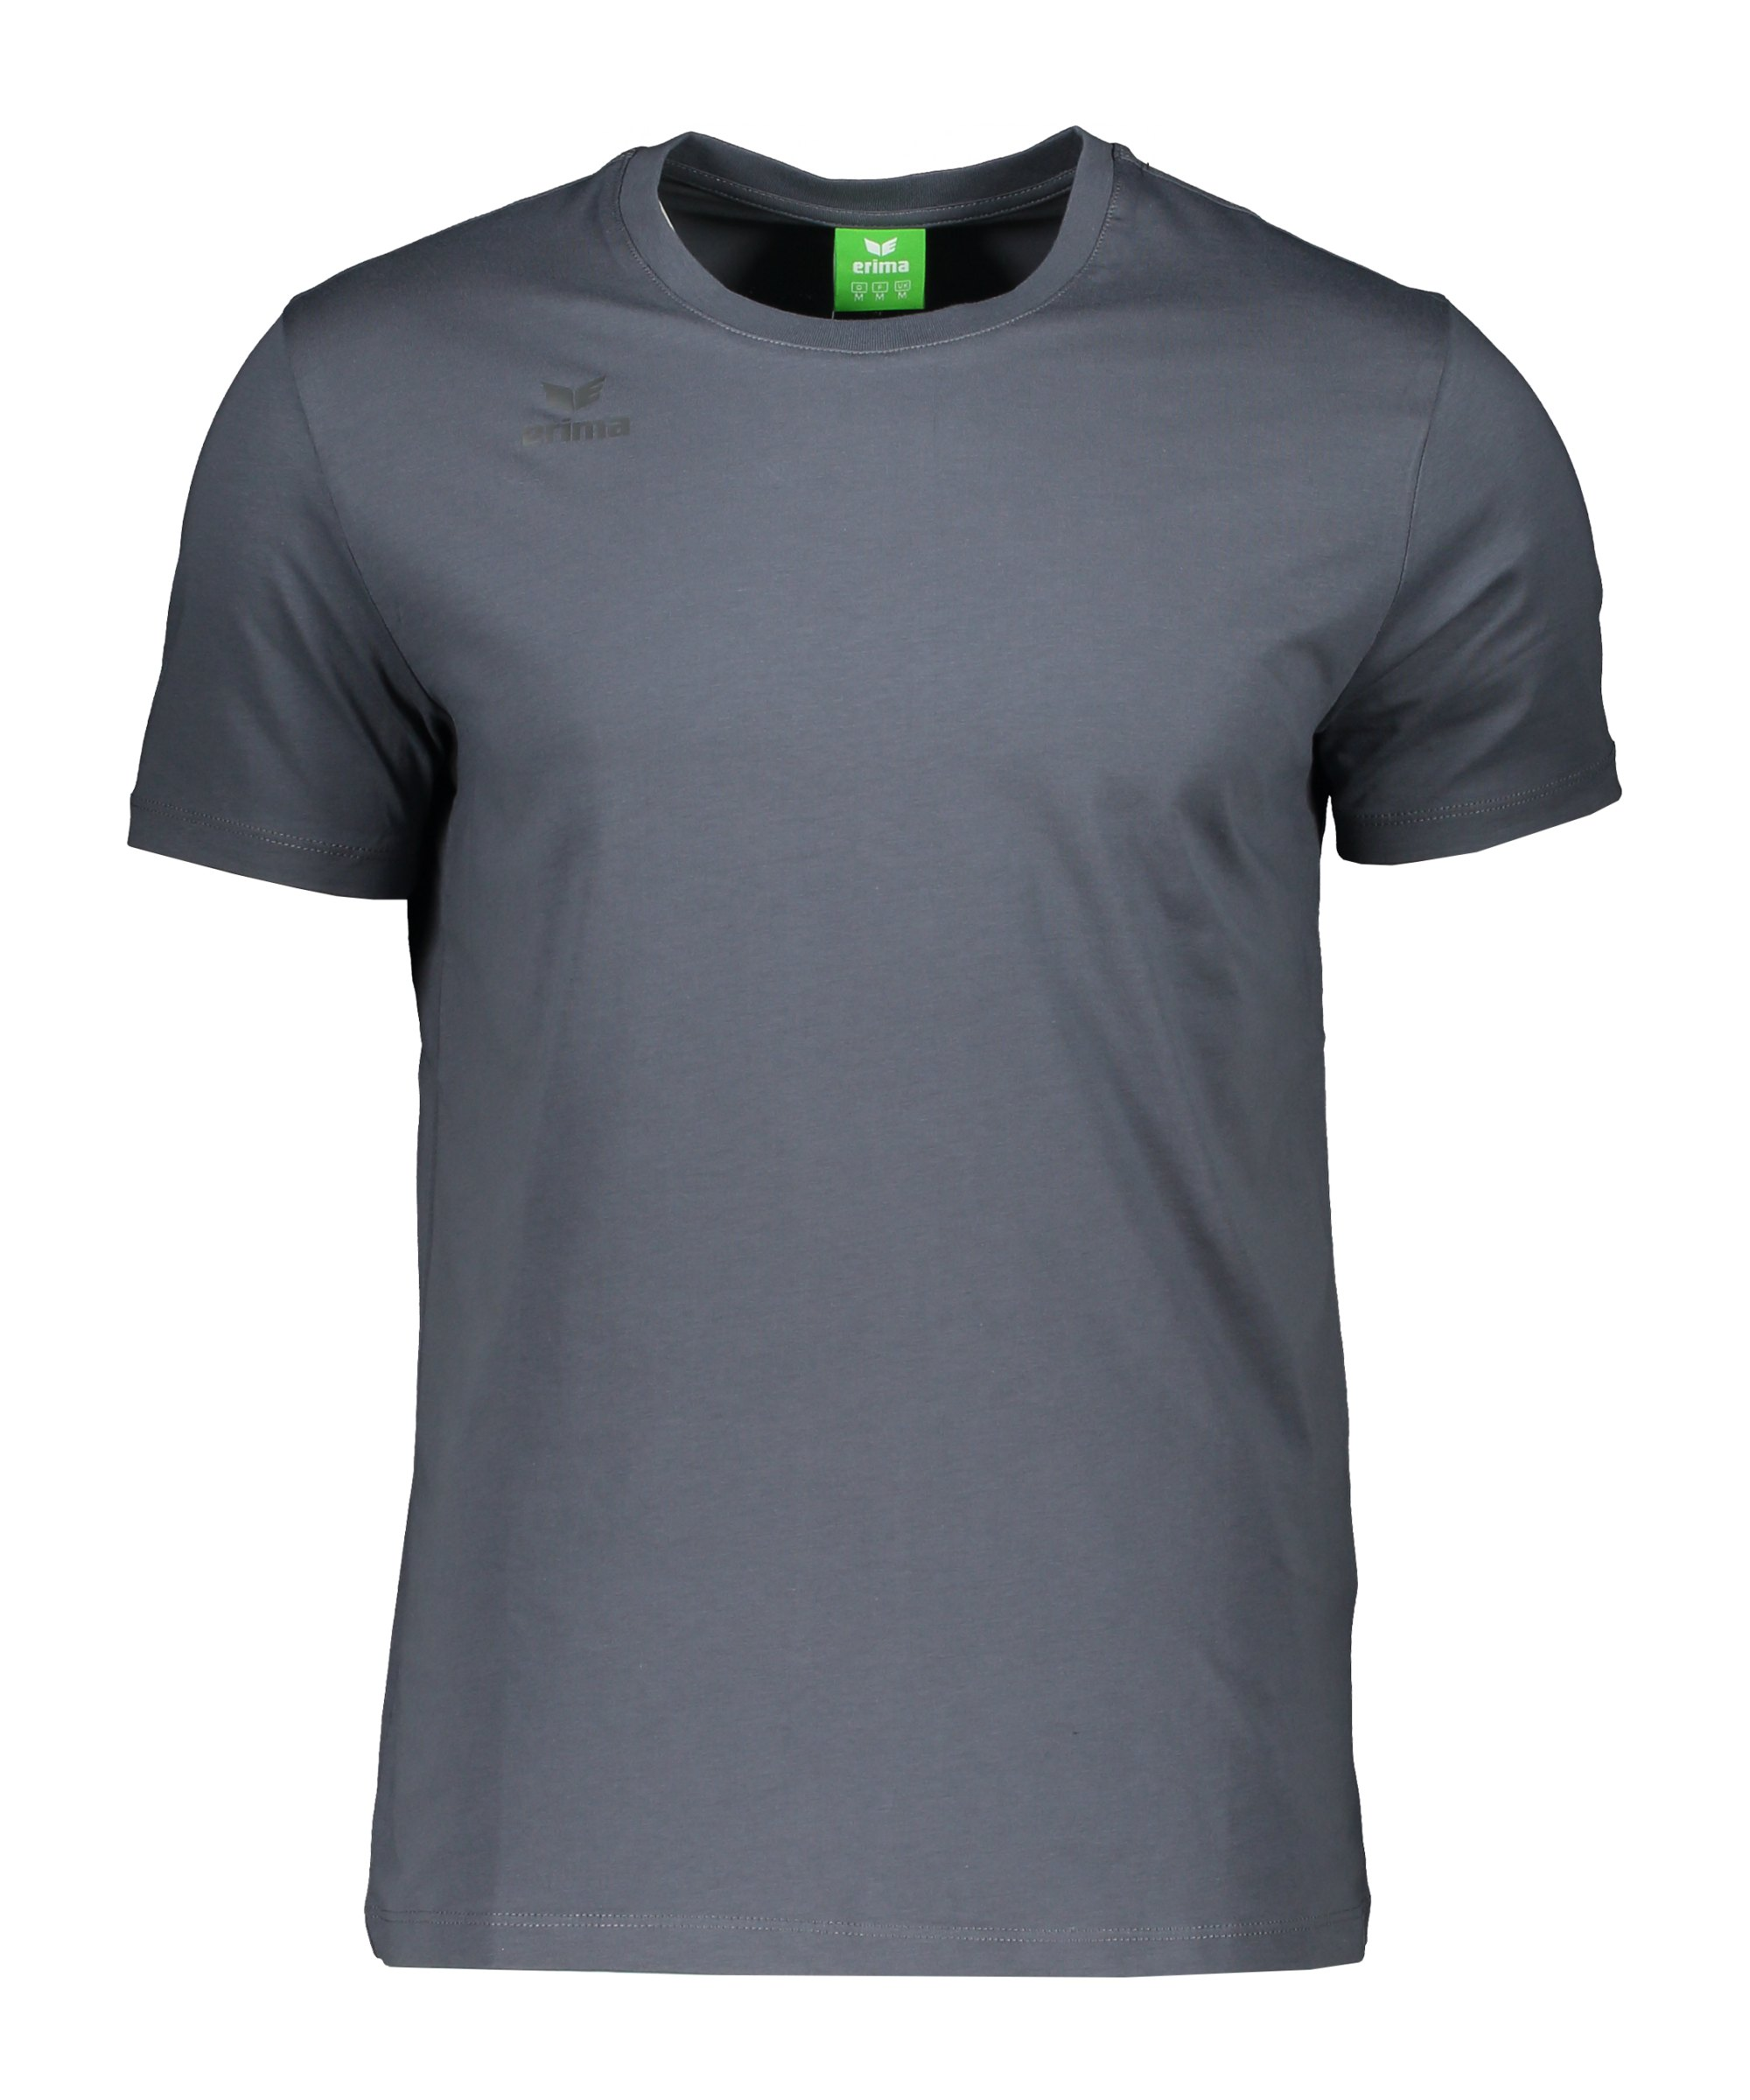 Erima Basic T-Shirt Grau - grau